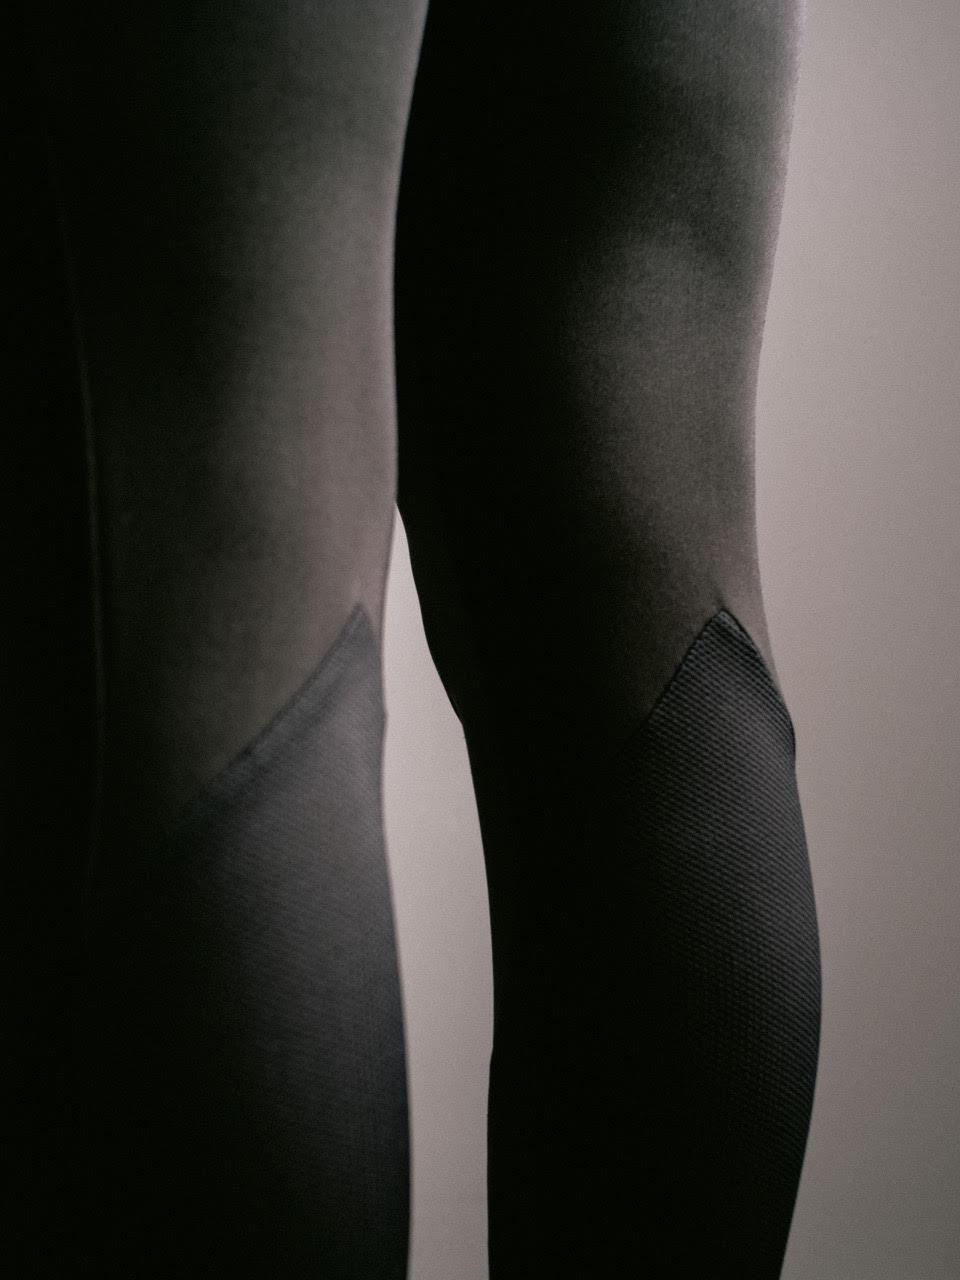 Creta Legging - Back Leg Detail